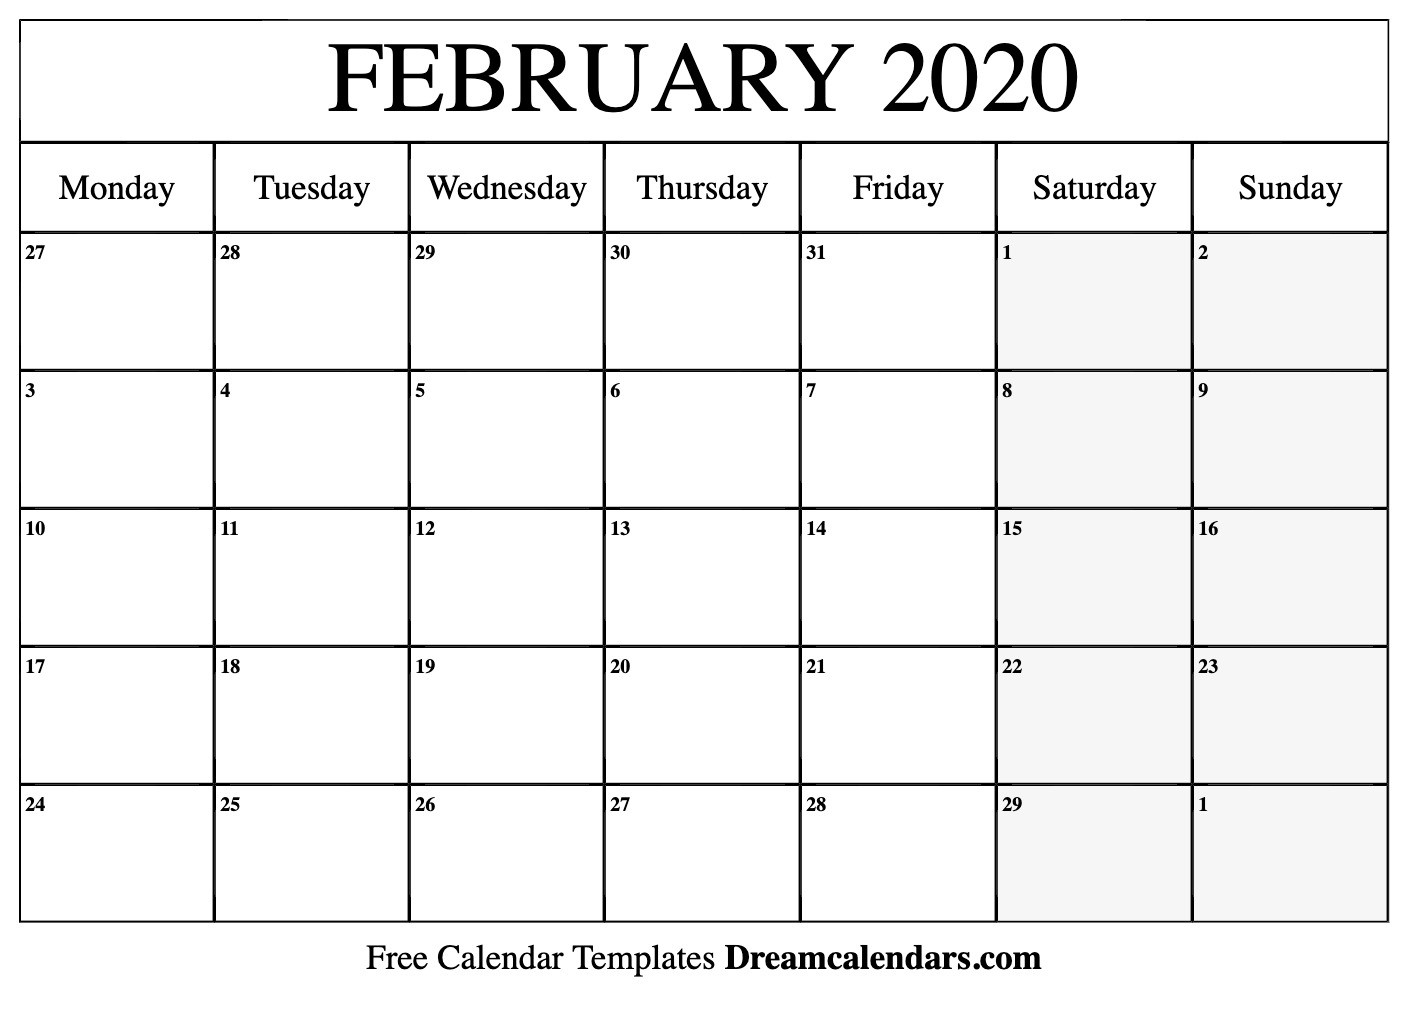 Free Blank February 2020 Printable Calendar-8 X 10 Prinable Blank Monthly Calendar